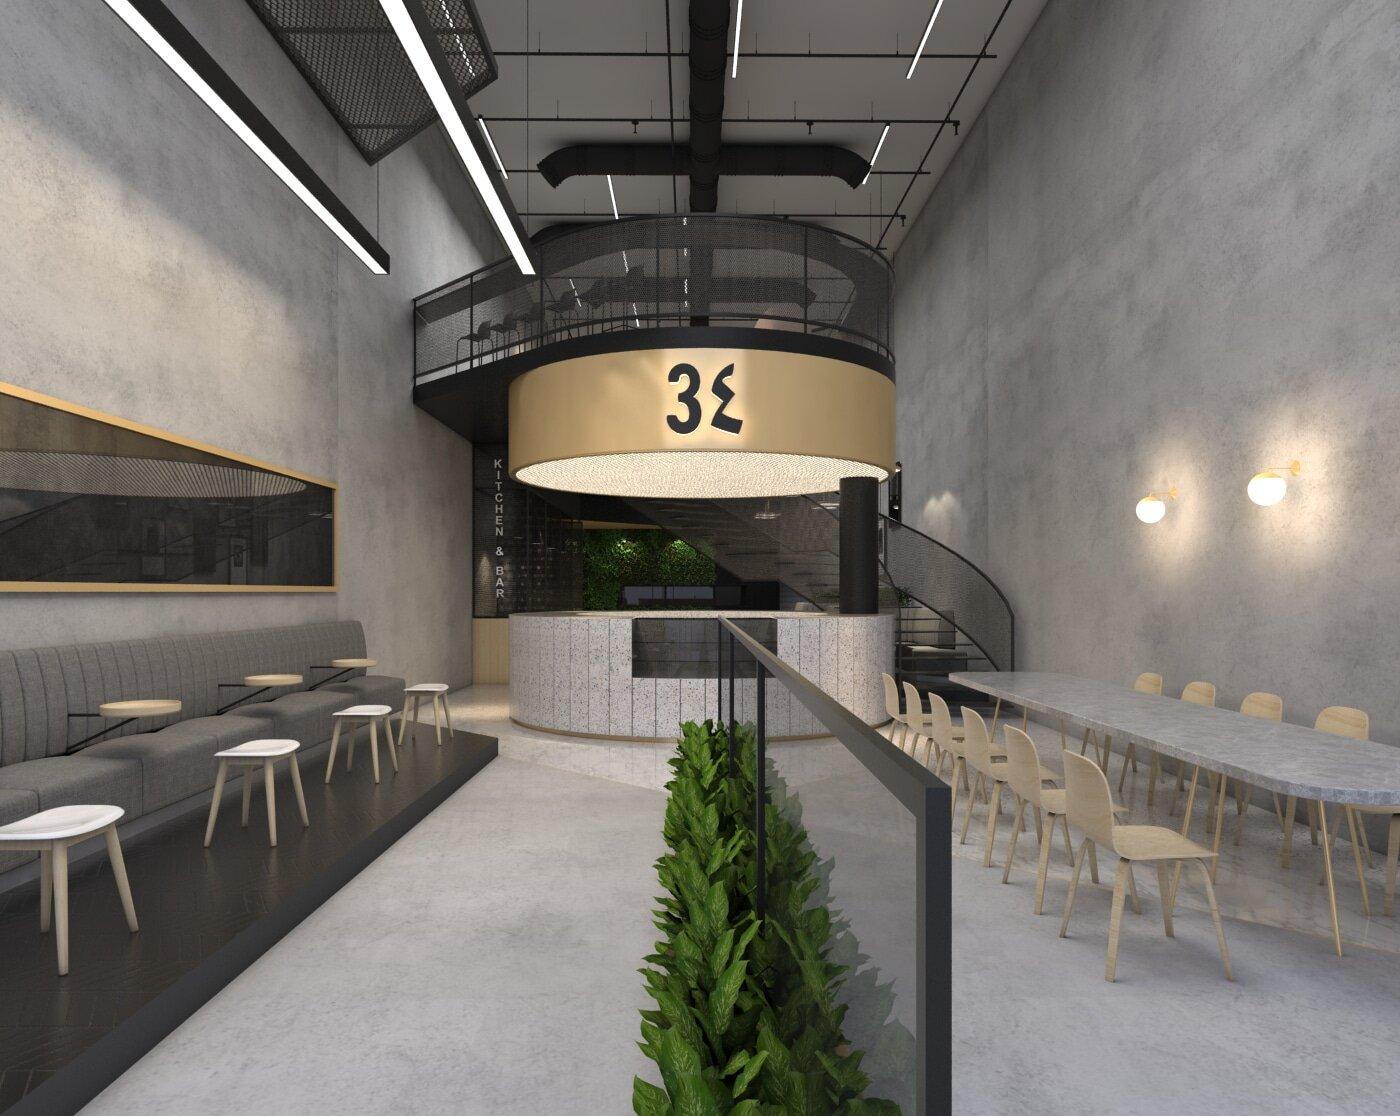 34 Cafe